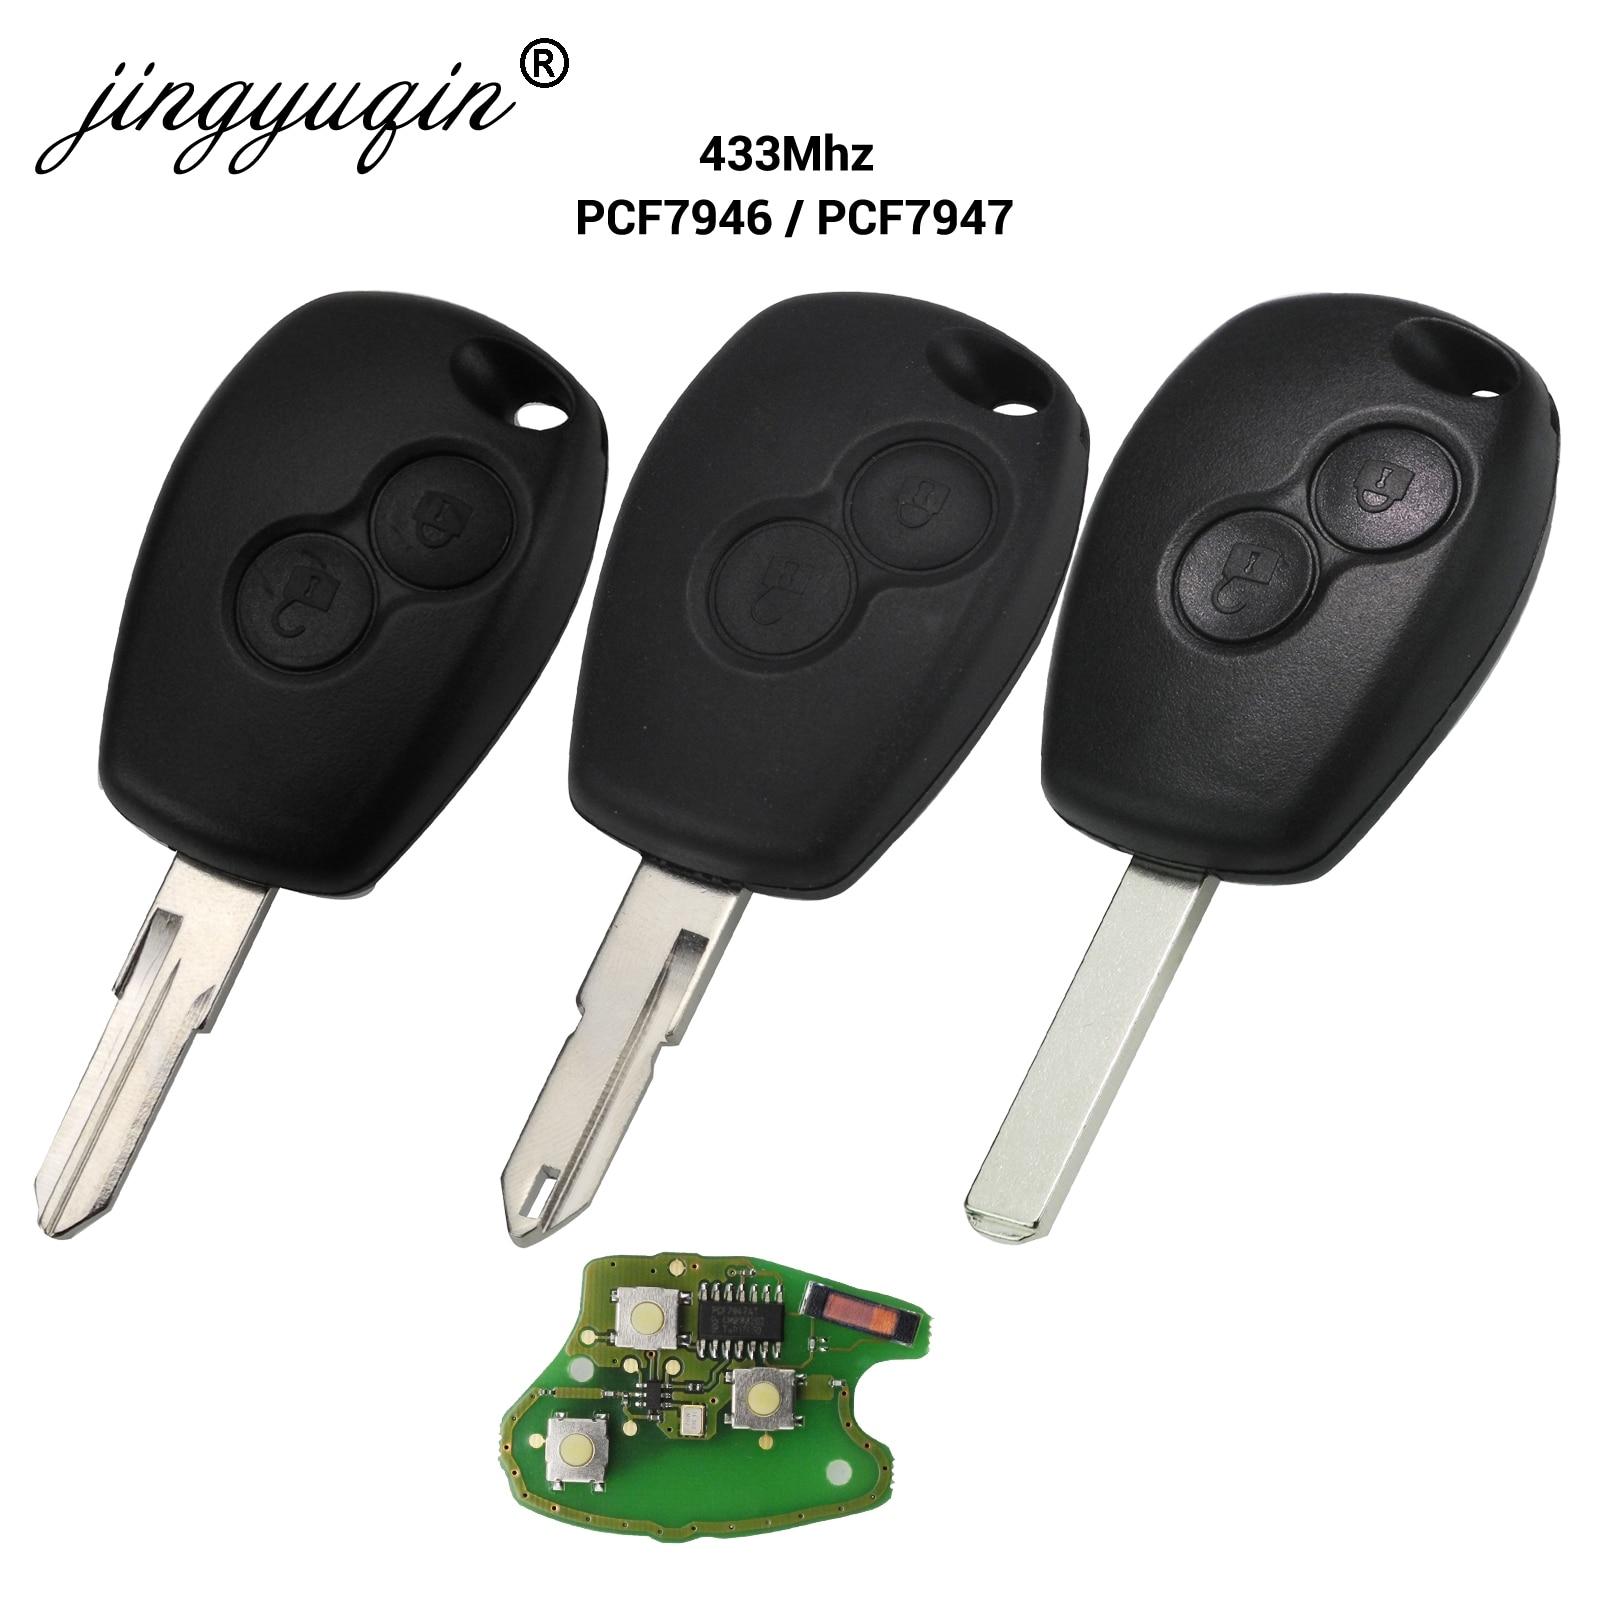 10x 2 Button Remote Car Key For Renault Duster Modus Clio 3 Twingo DACIA Logan Sandero